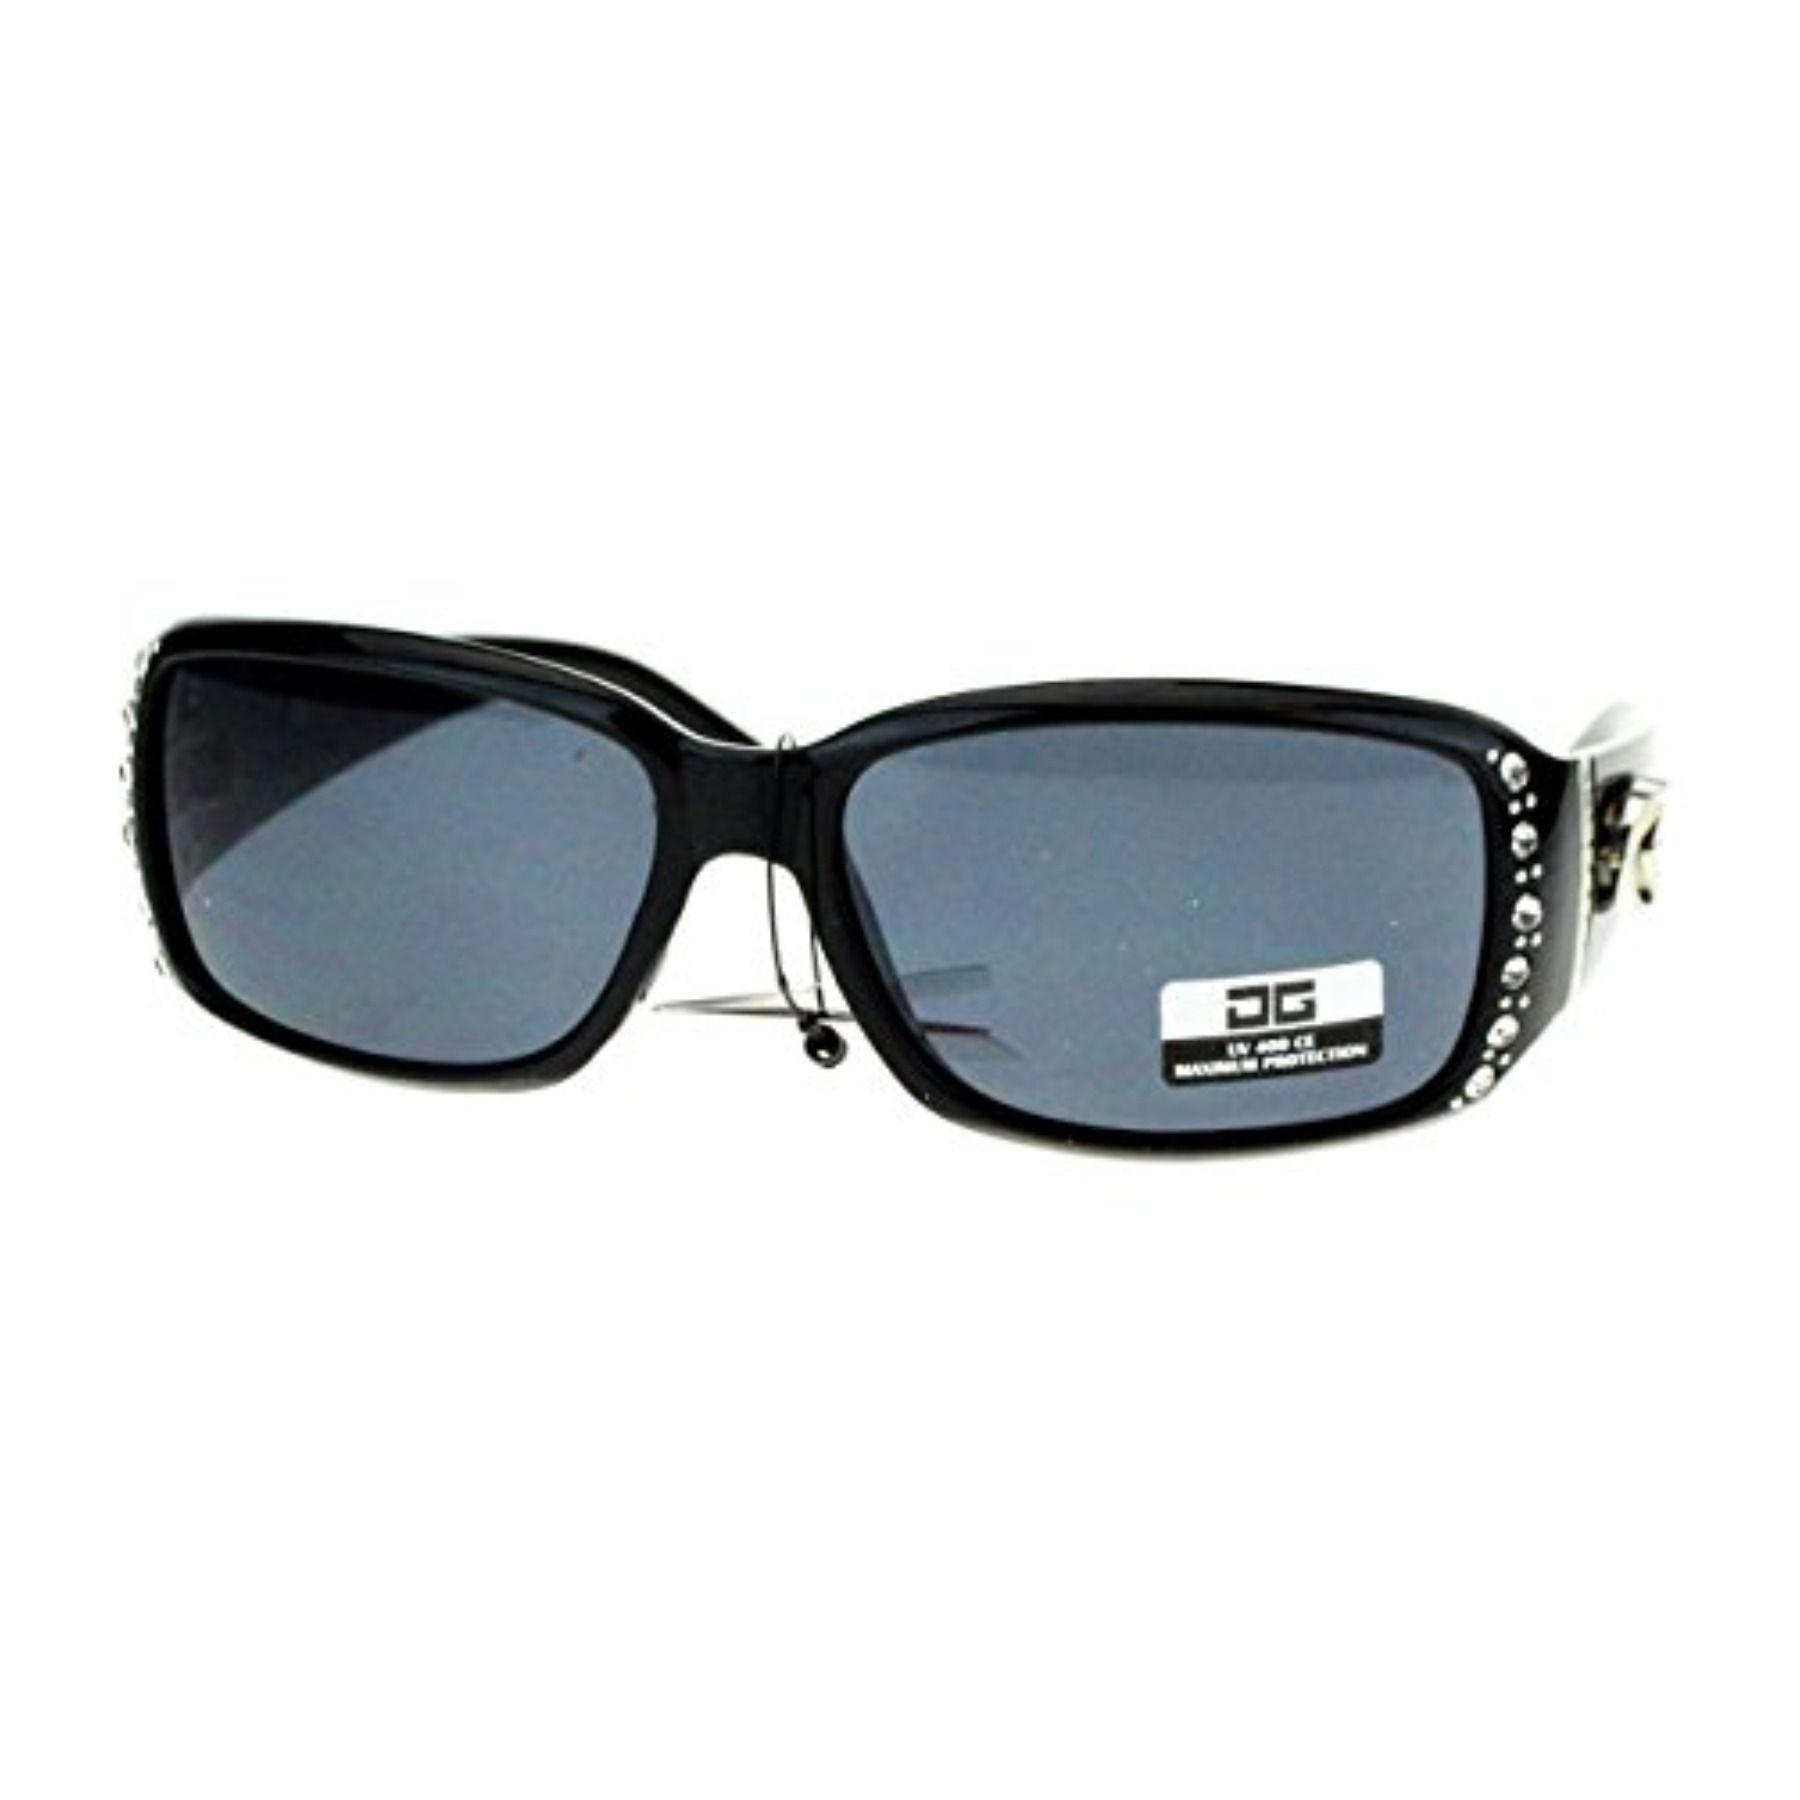 Check out 'CG Eyewear Womens Rhinestones Sunglasses